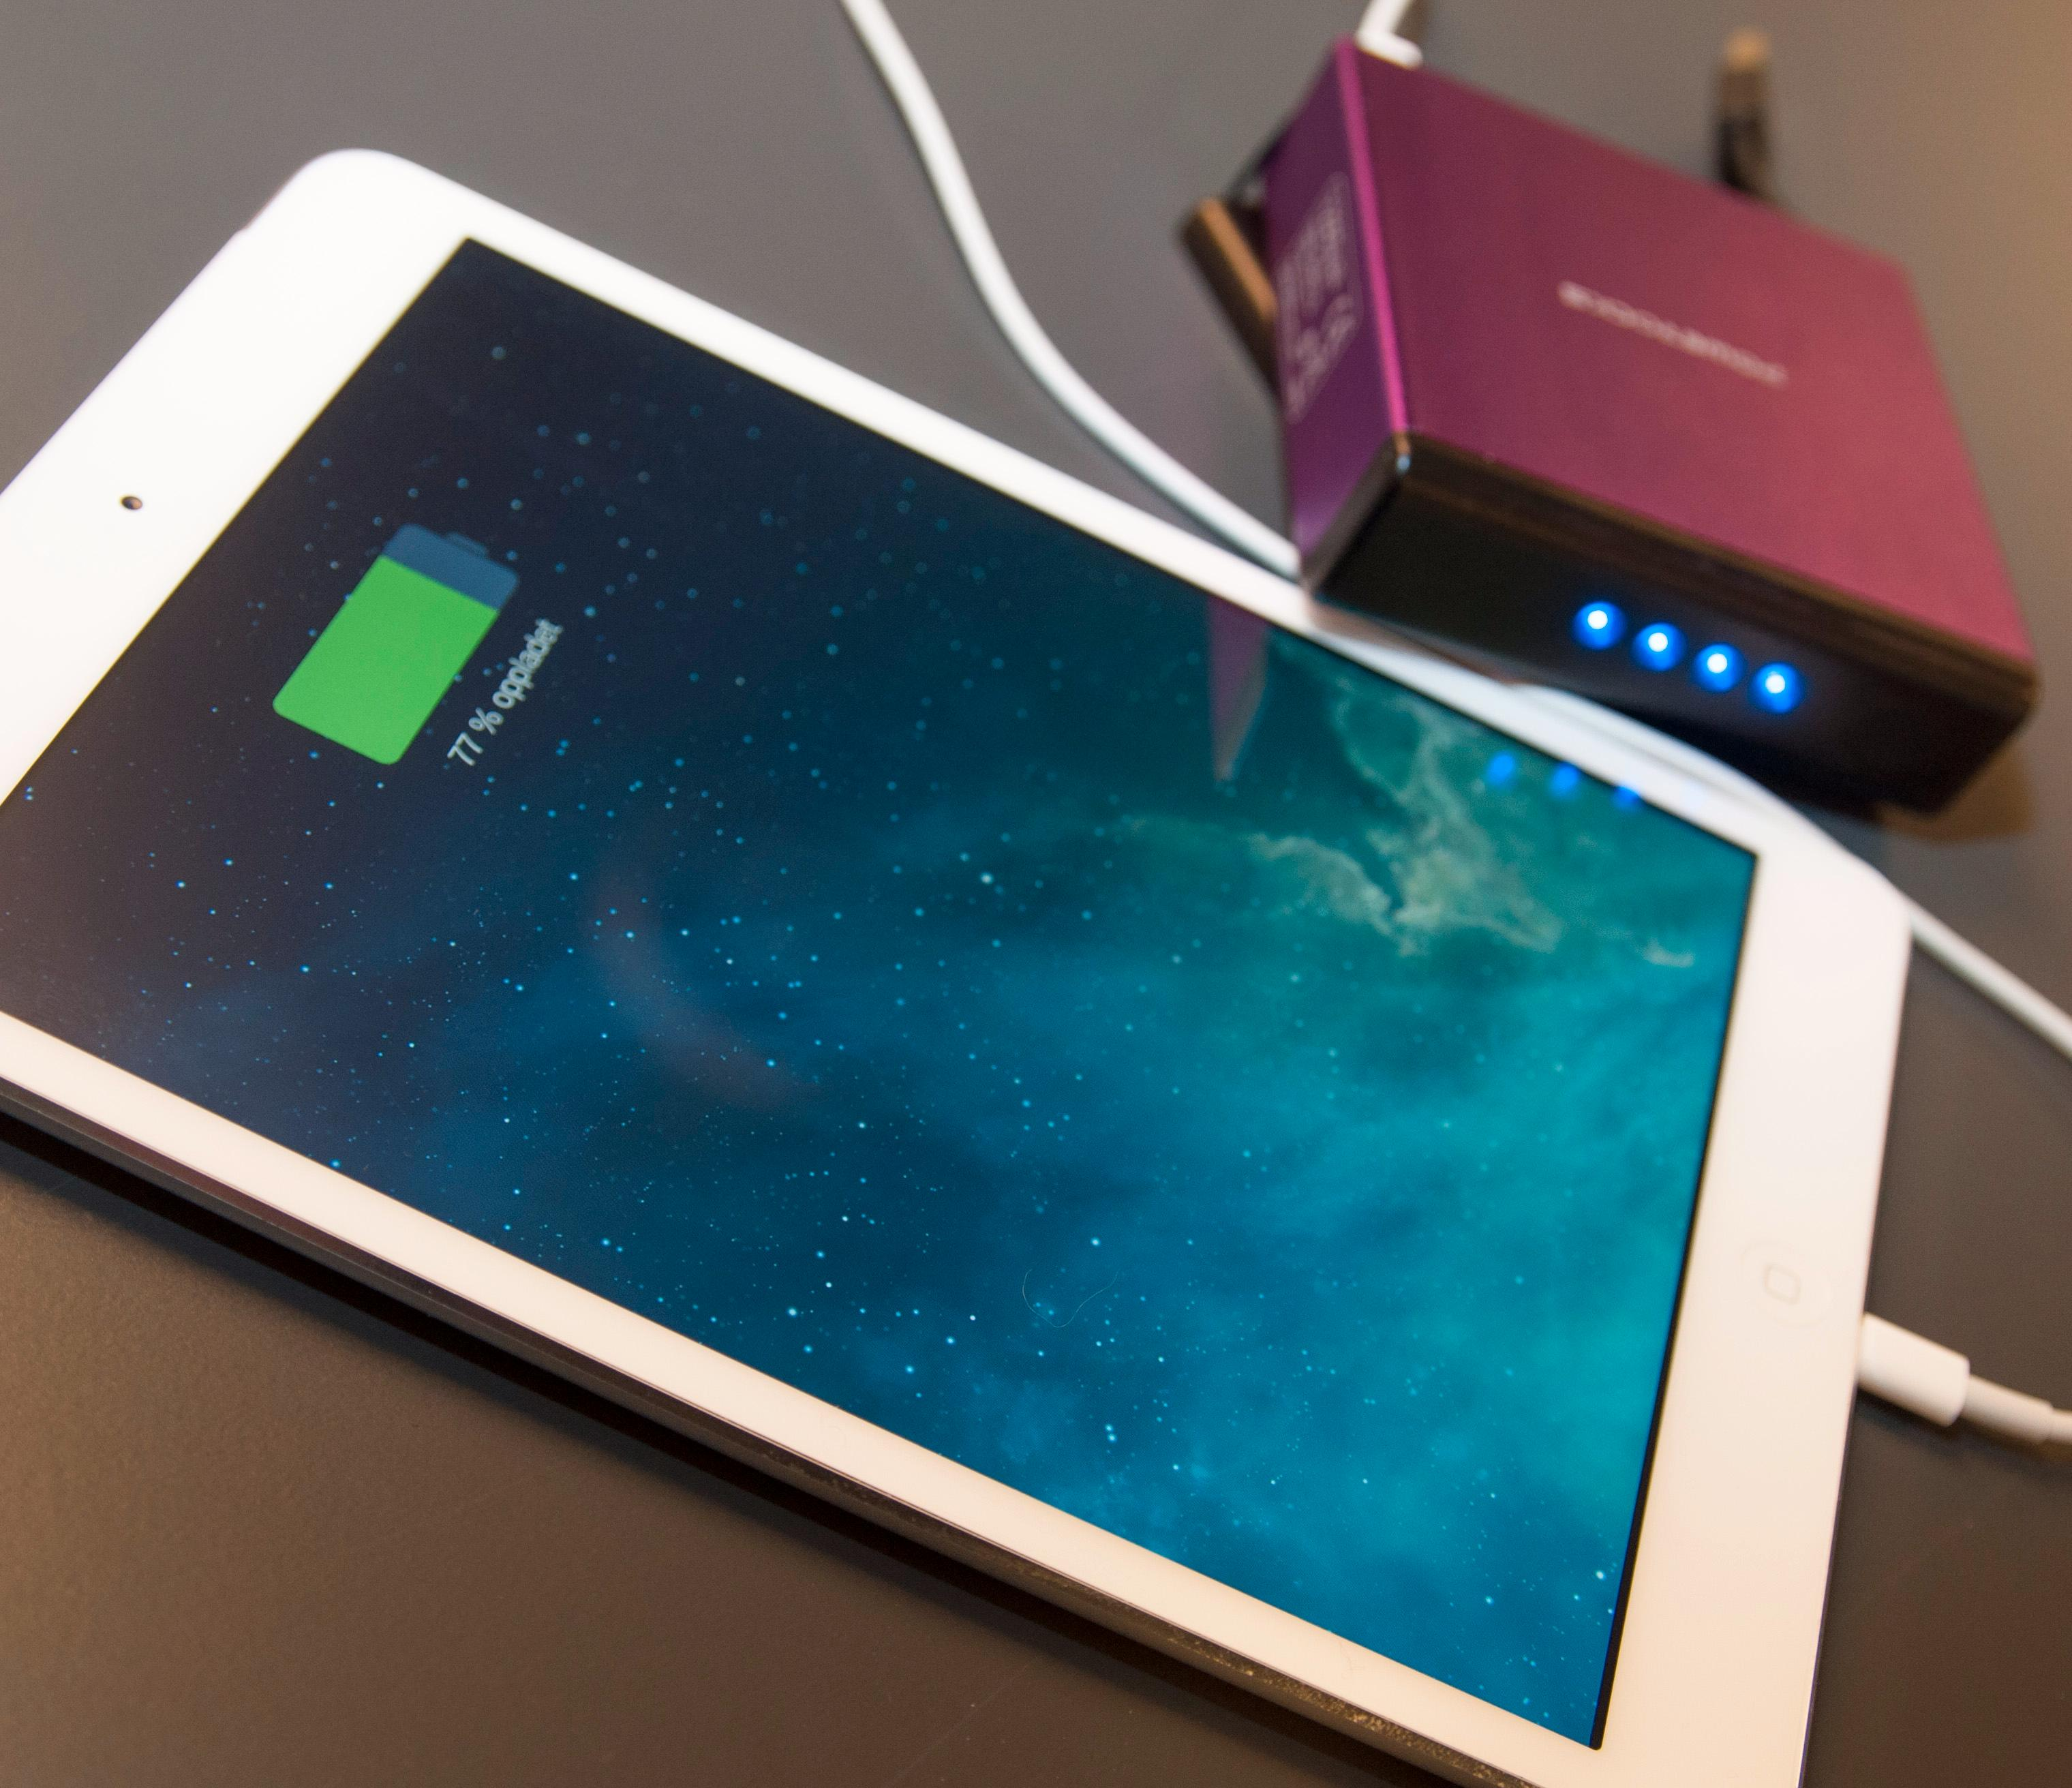 Har du en iPad Mini Retina skal Magic Cube kunne lade den halvannen gang. Med fulladet nettbrett, og powerbank, gir det deg rundt 25 timers brukstid.Foto: Finn Jarle Kvalheim, Amobil.no